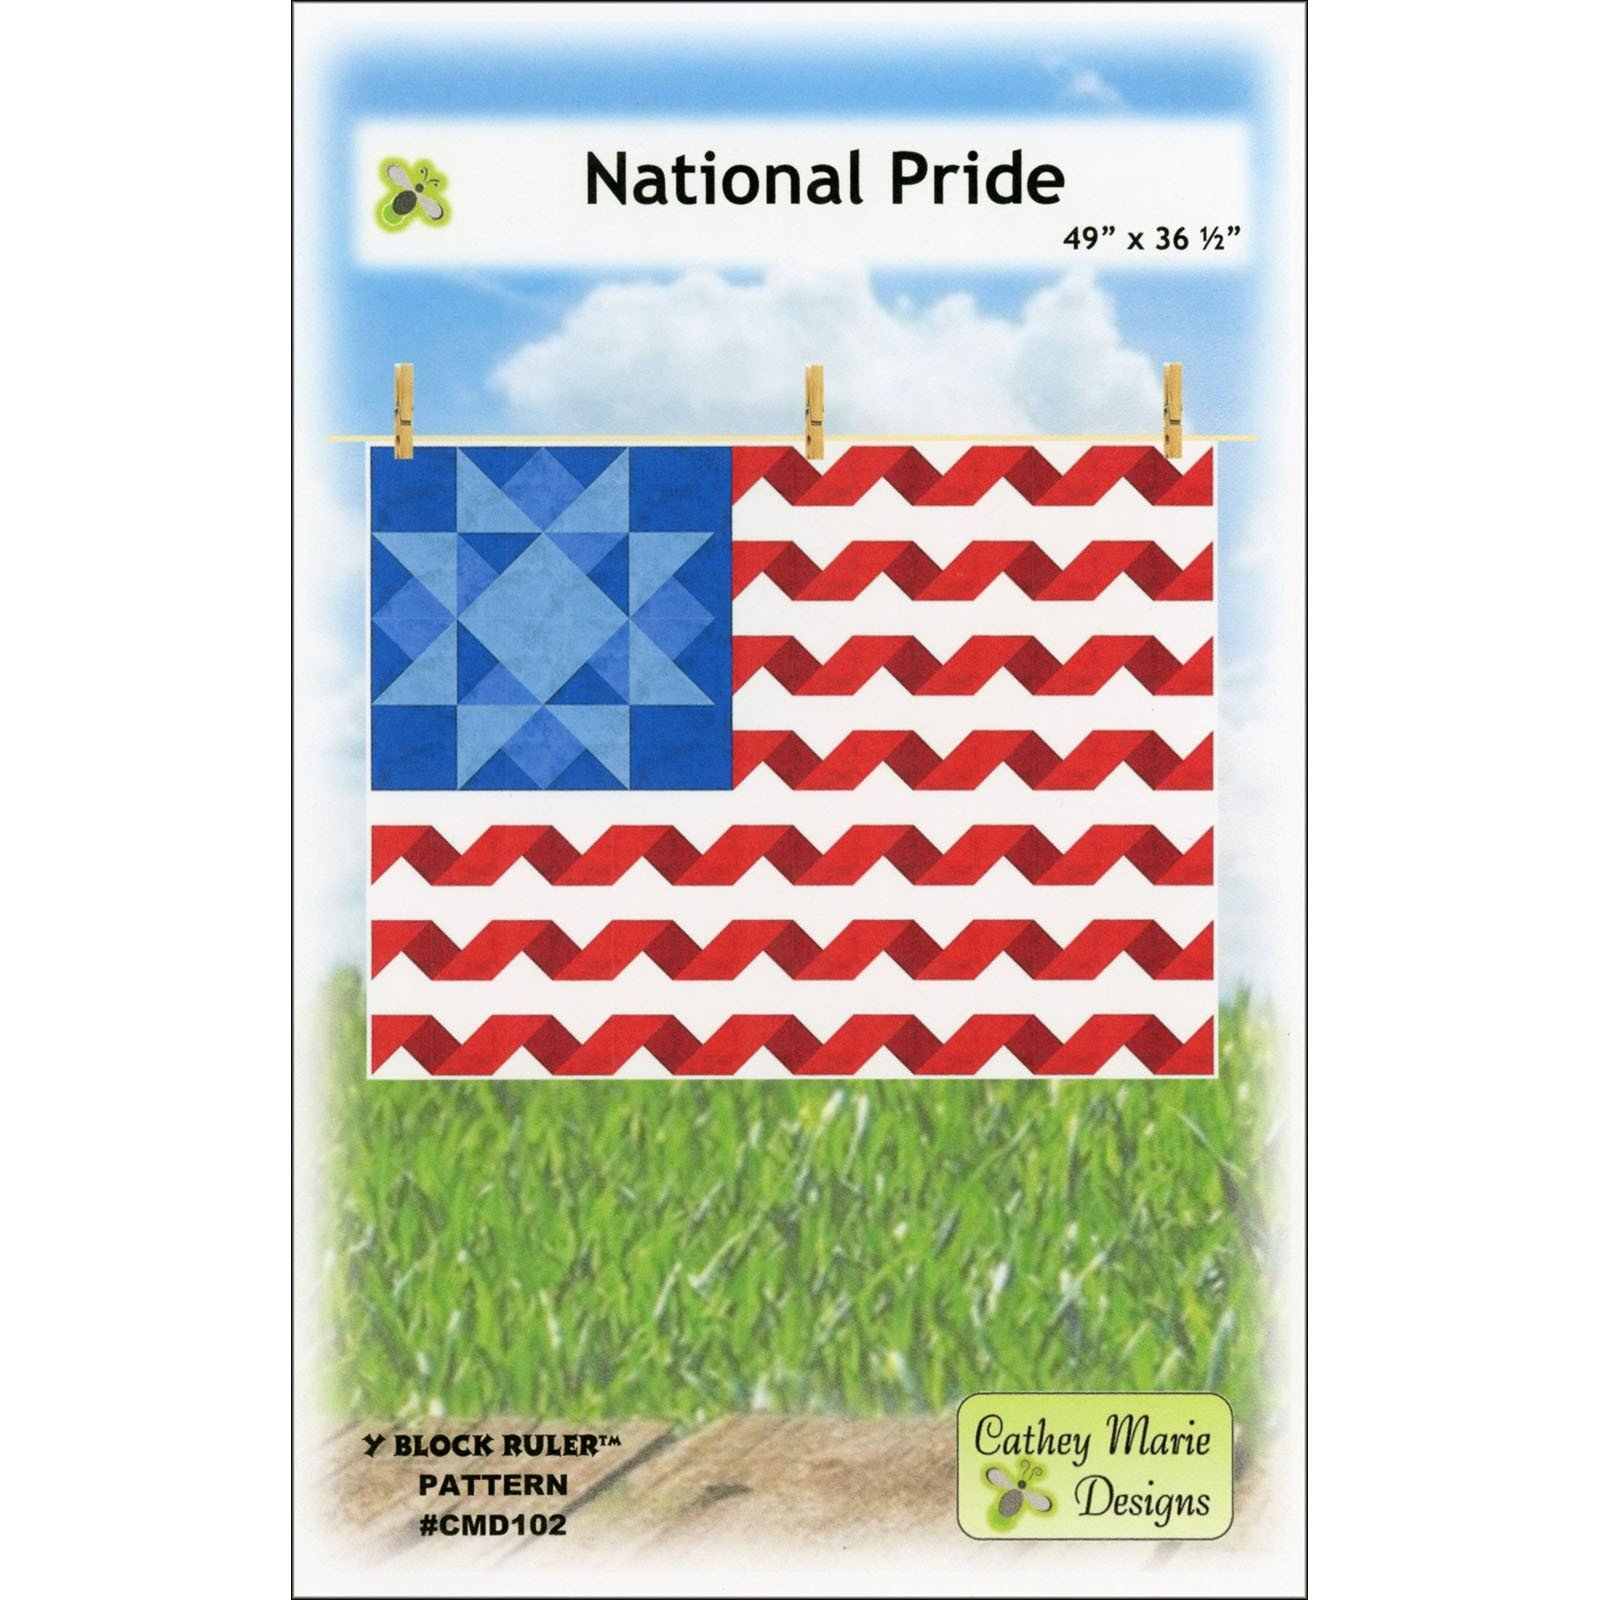 National Pride Y Block Ruler Quilt Pattern